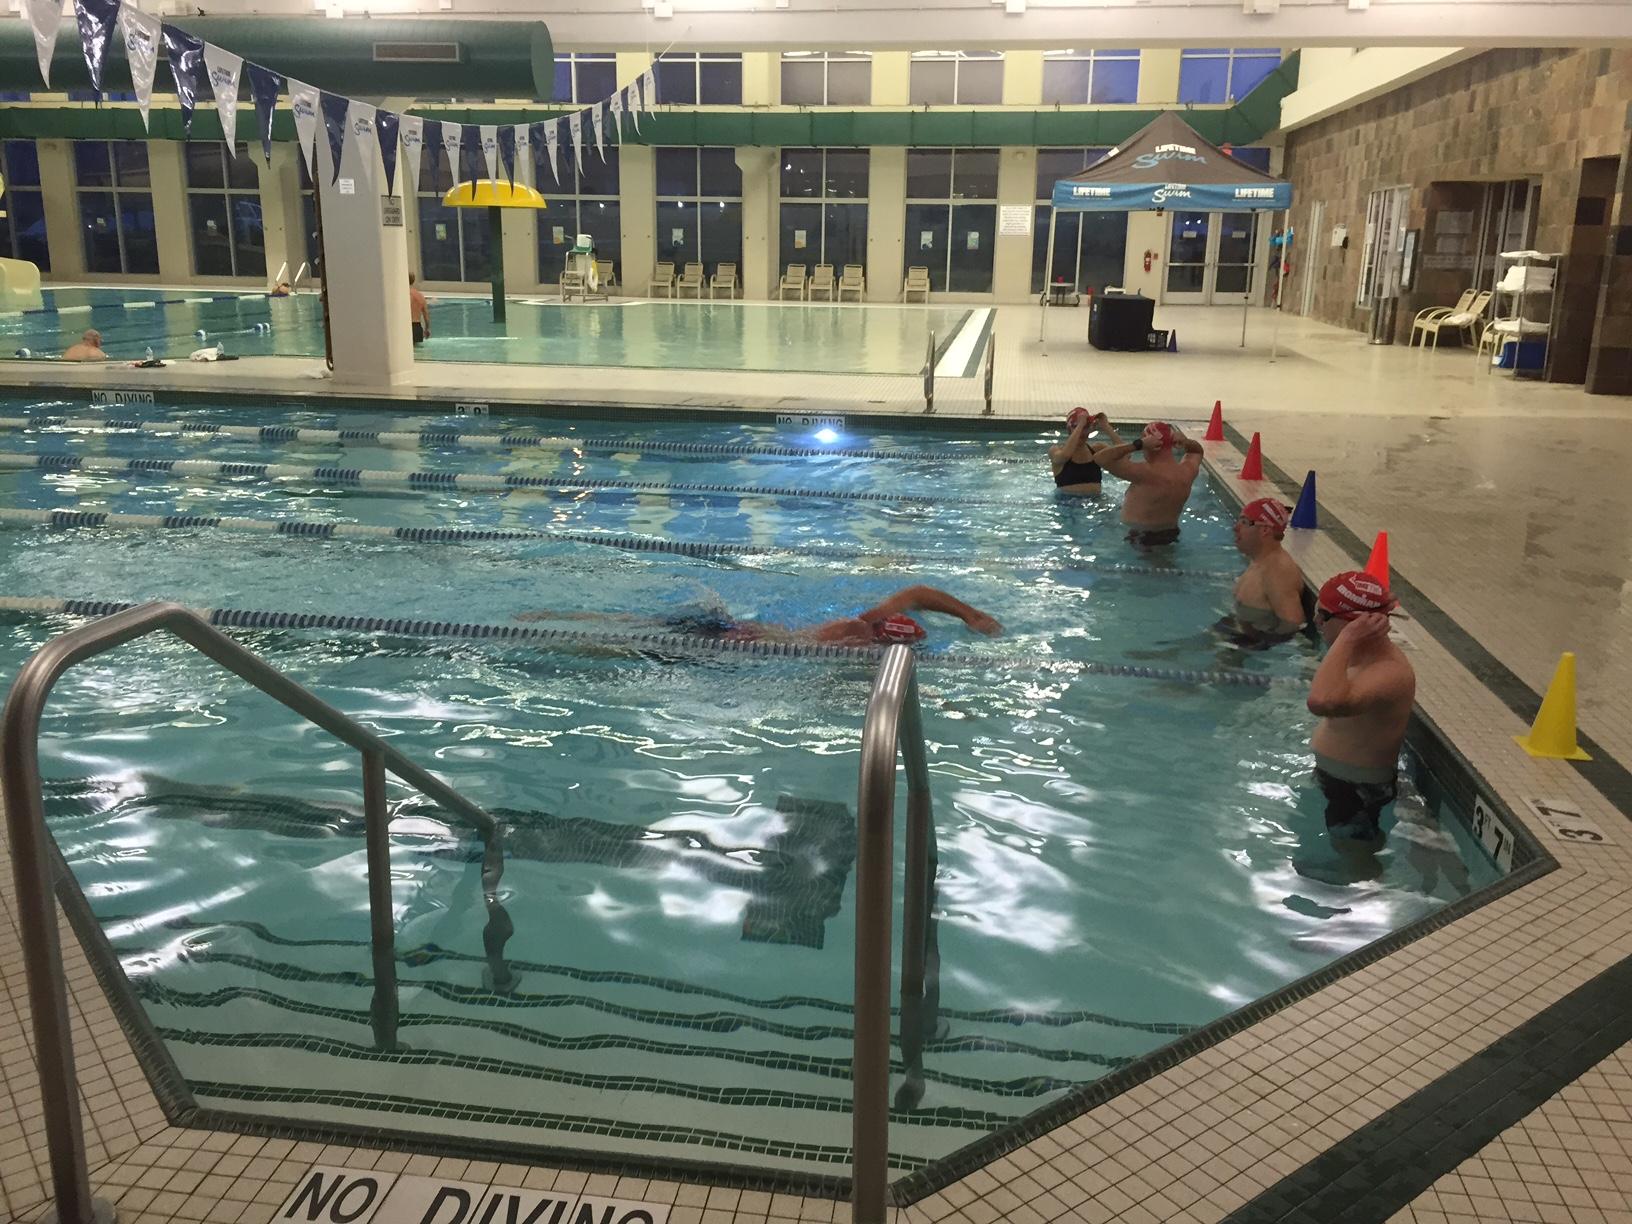 Lifetime fitness vernon hills outdoor pool hours mloovi blog for Garden hills pool hours